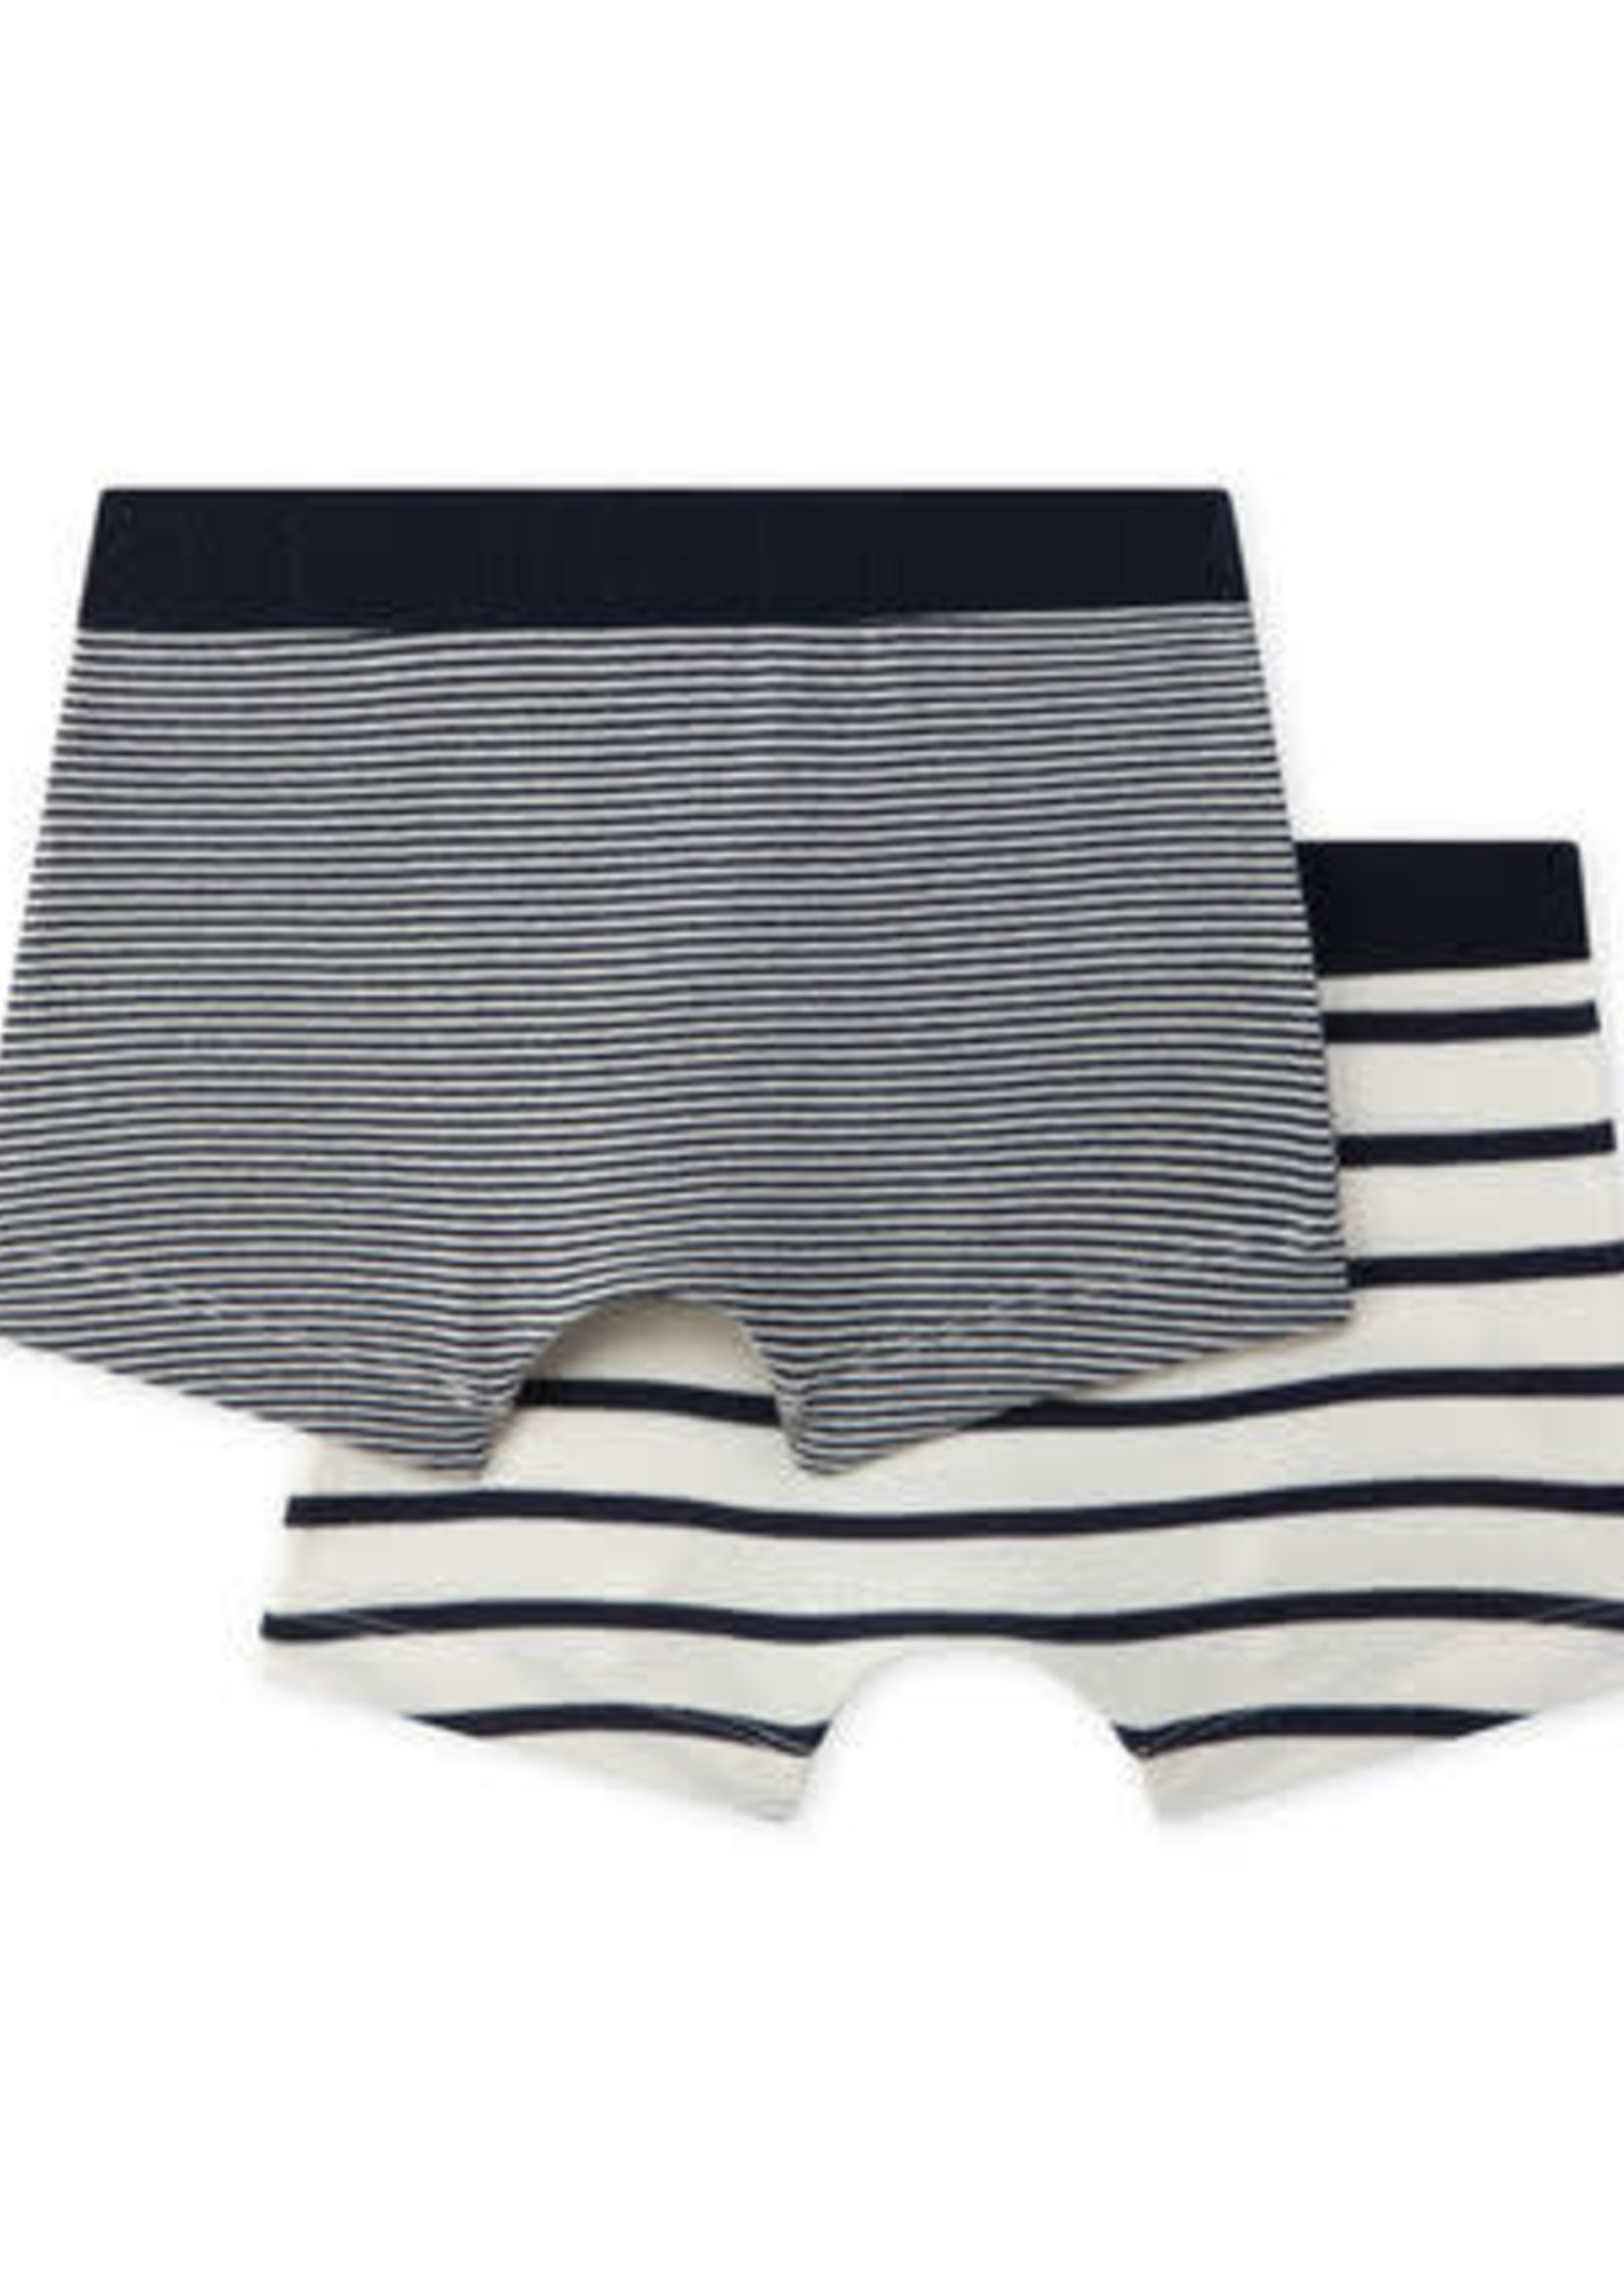 Petit Bateau Petit Bateau Boys' Boxer Shorts Sets SS20-5334300